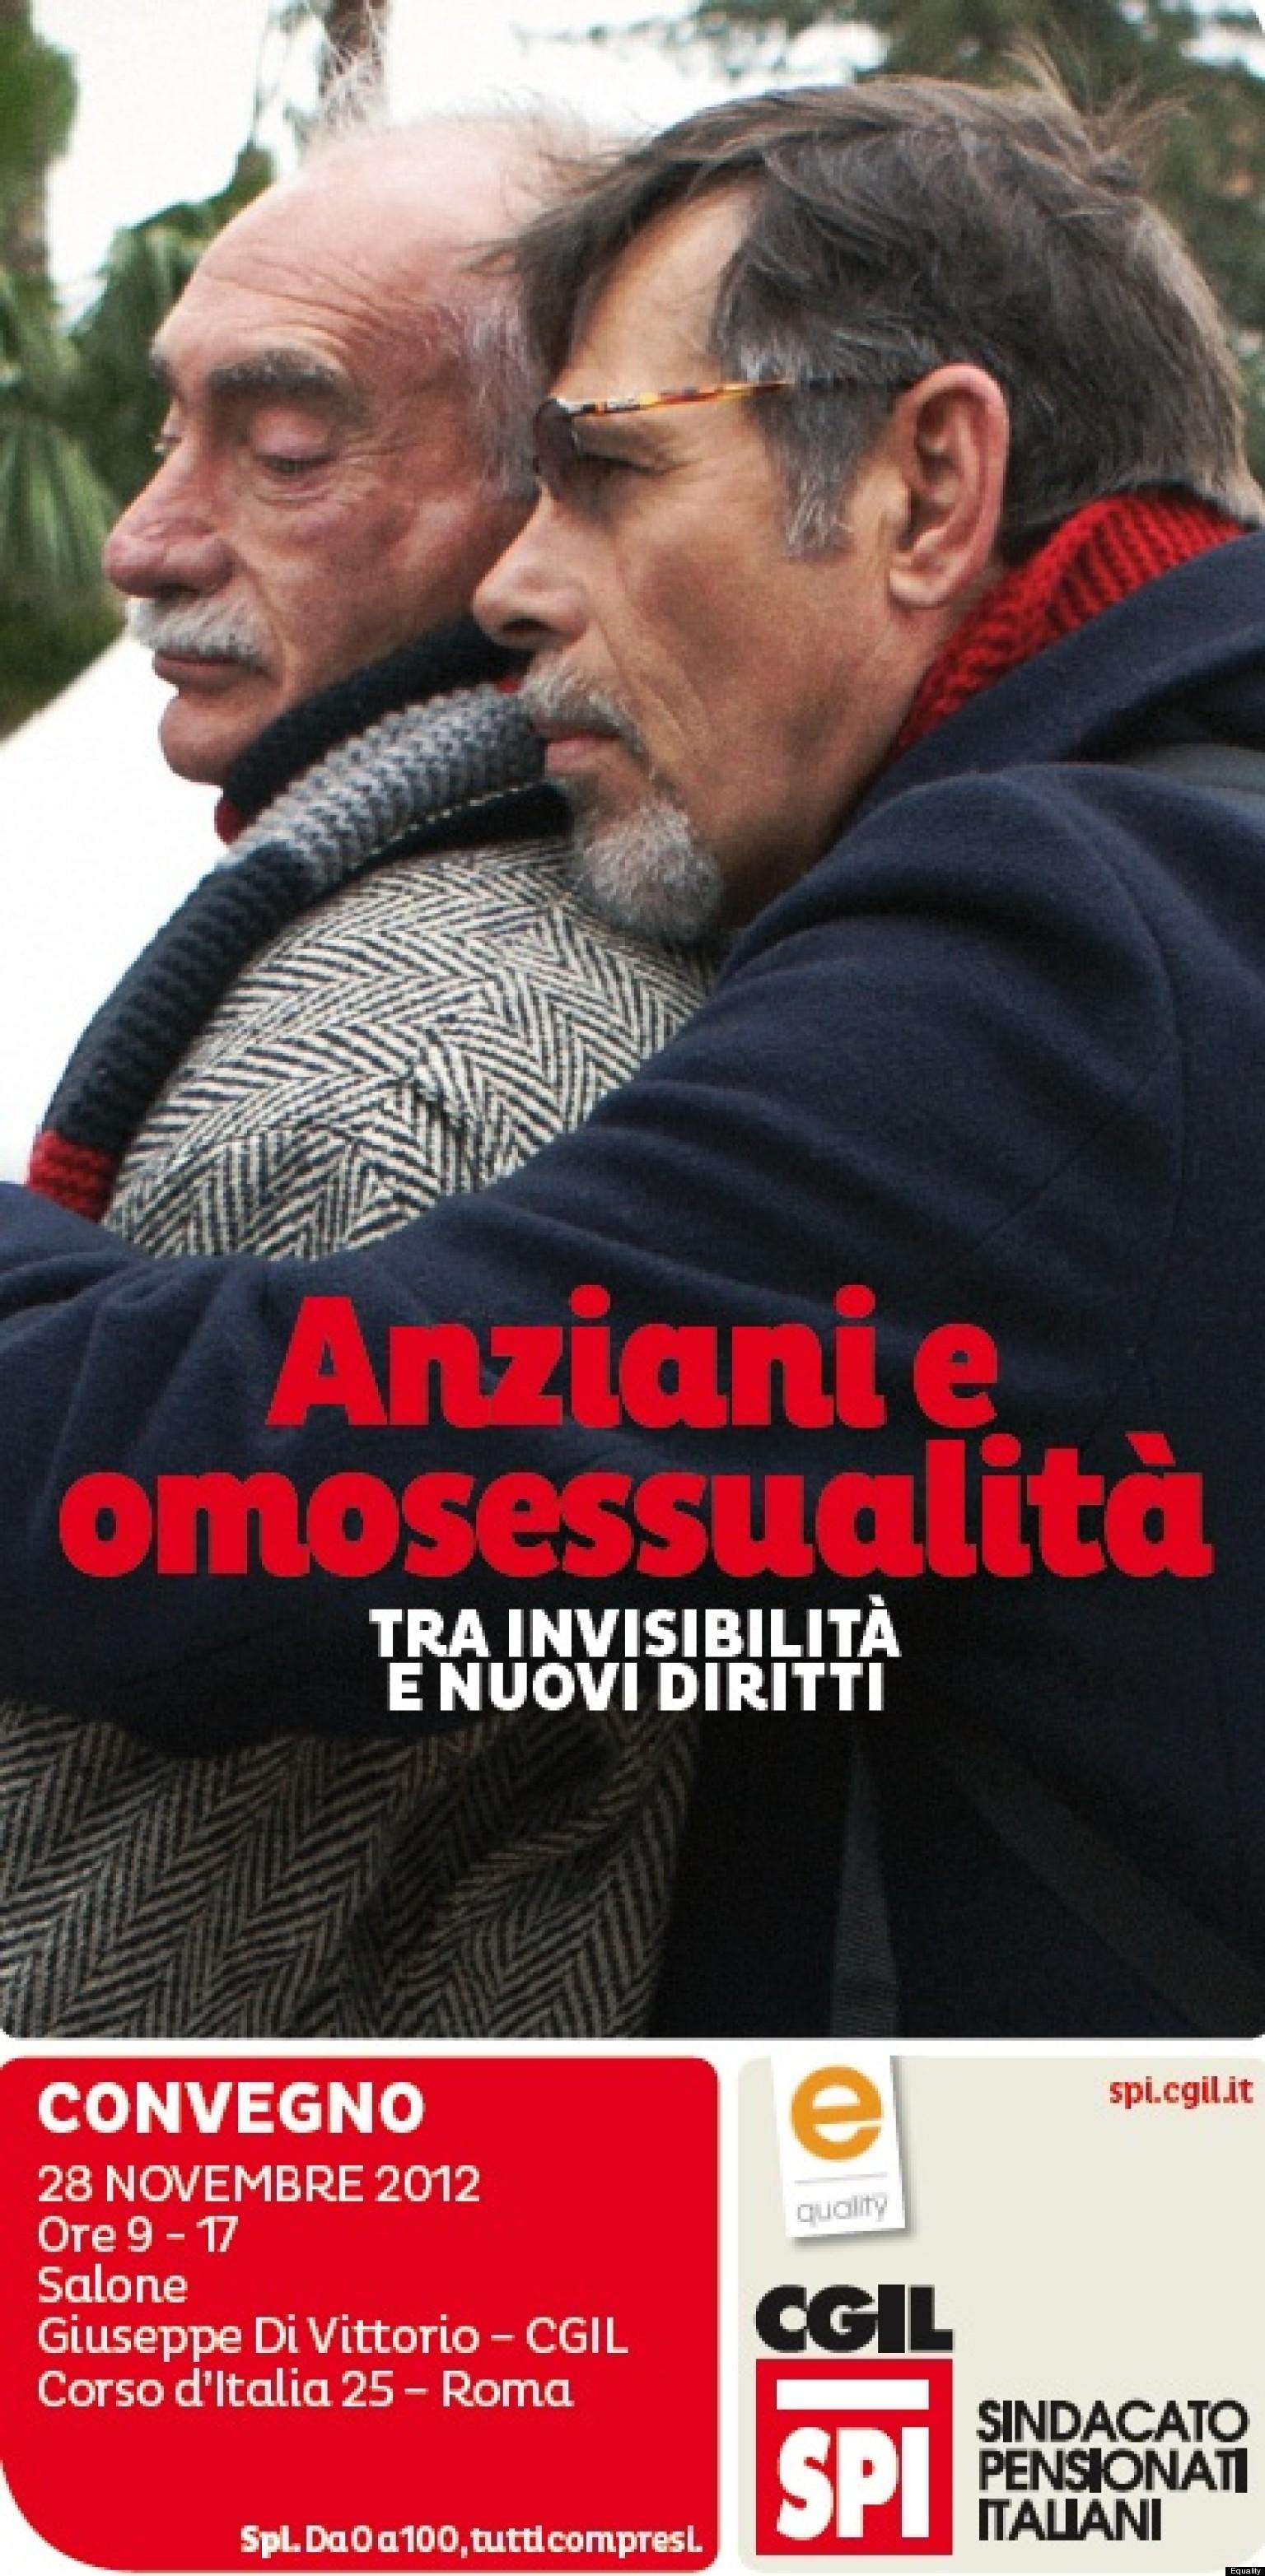 annunci roma gay anunc gay bear